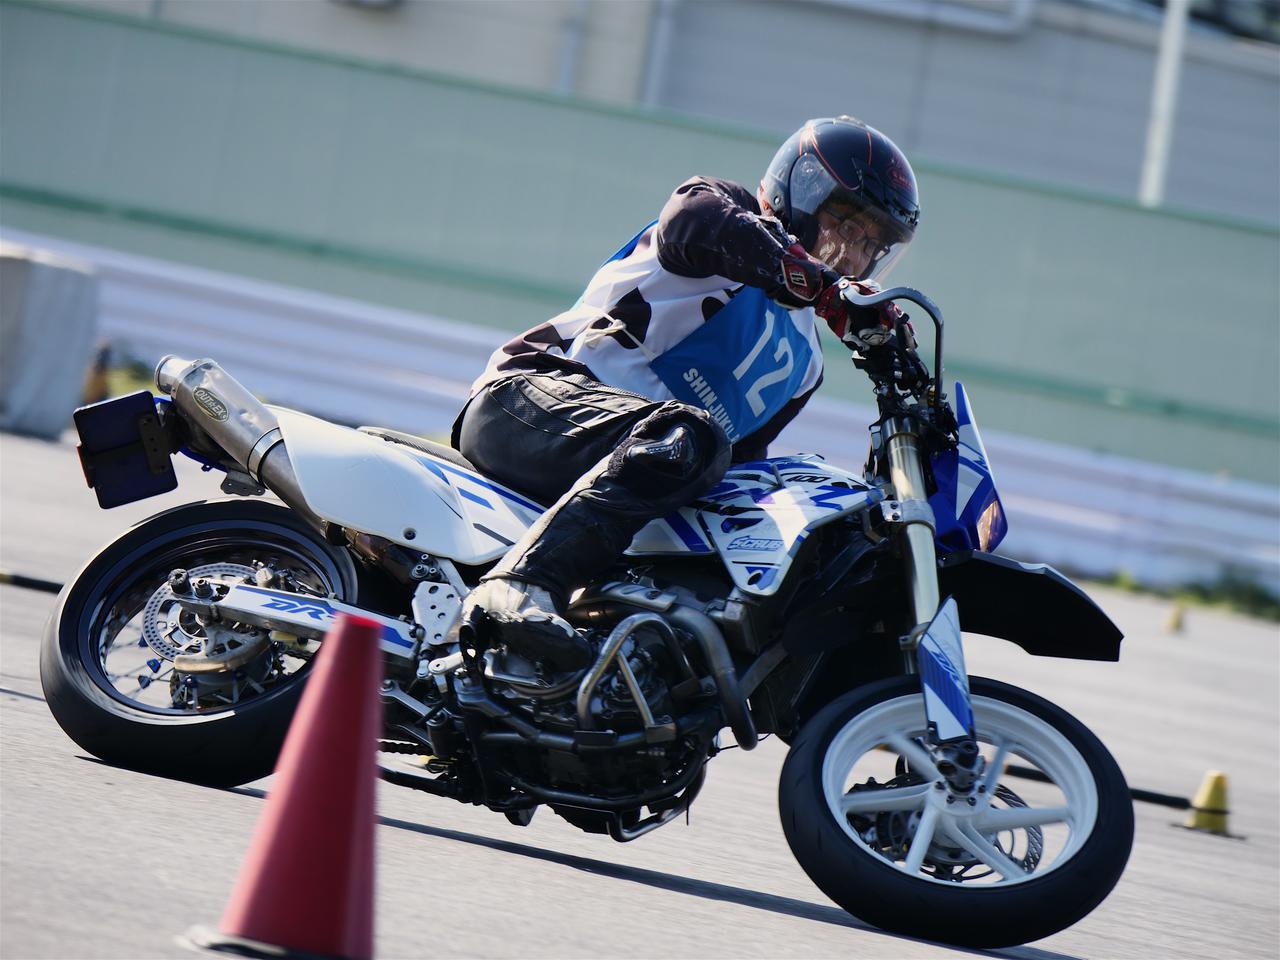 Images : 14番目の画像 - 2019ダンロップ・オートバイ杯ジムカーナ第5戦 - webオートバイ